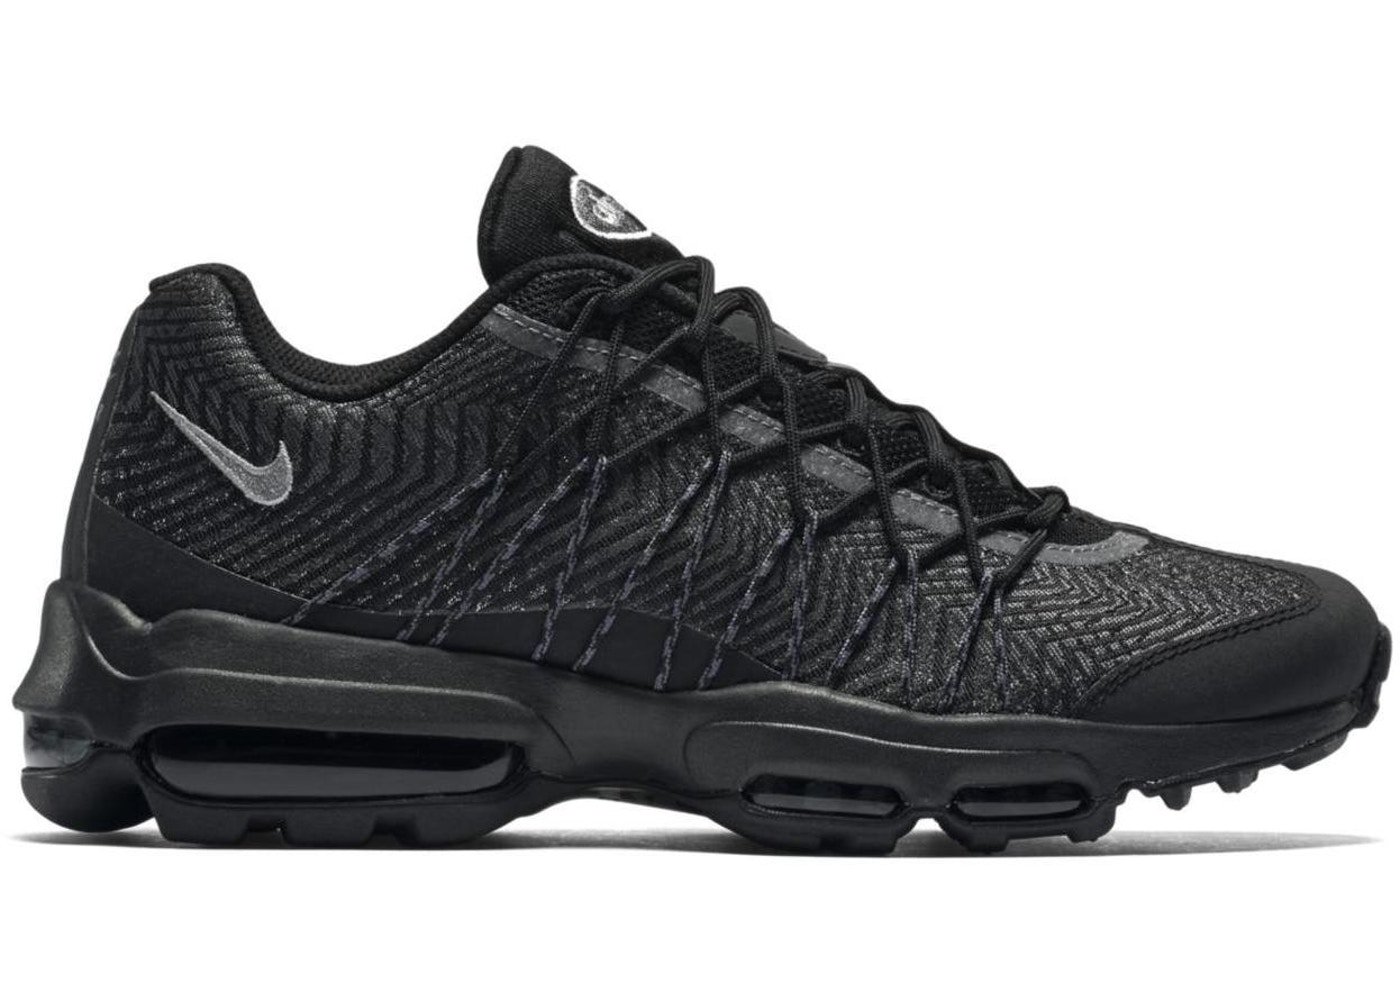 sports shoes d540f a4ee9 Air Max 95 Jacquard Black Silver - 749771-001